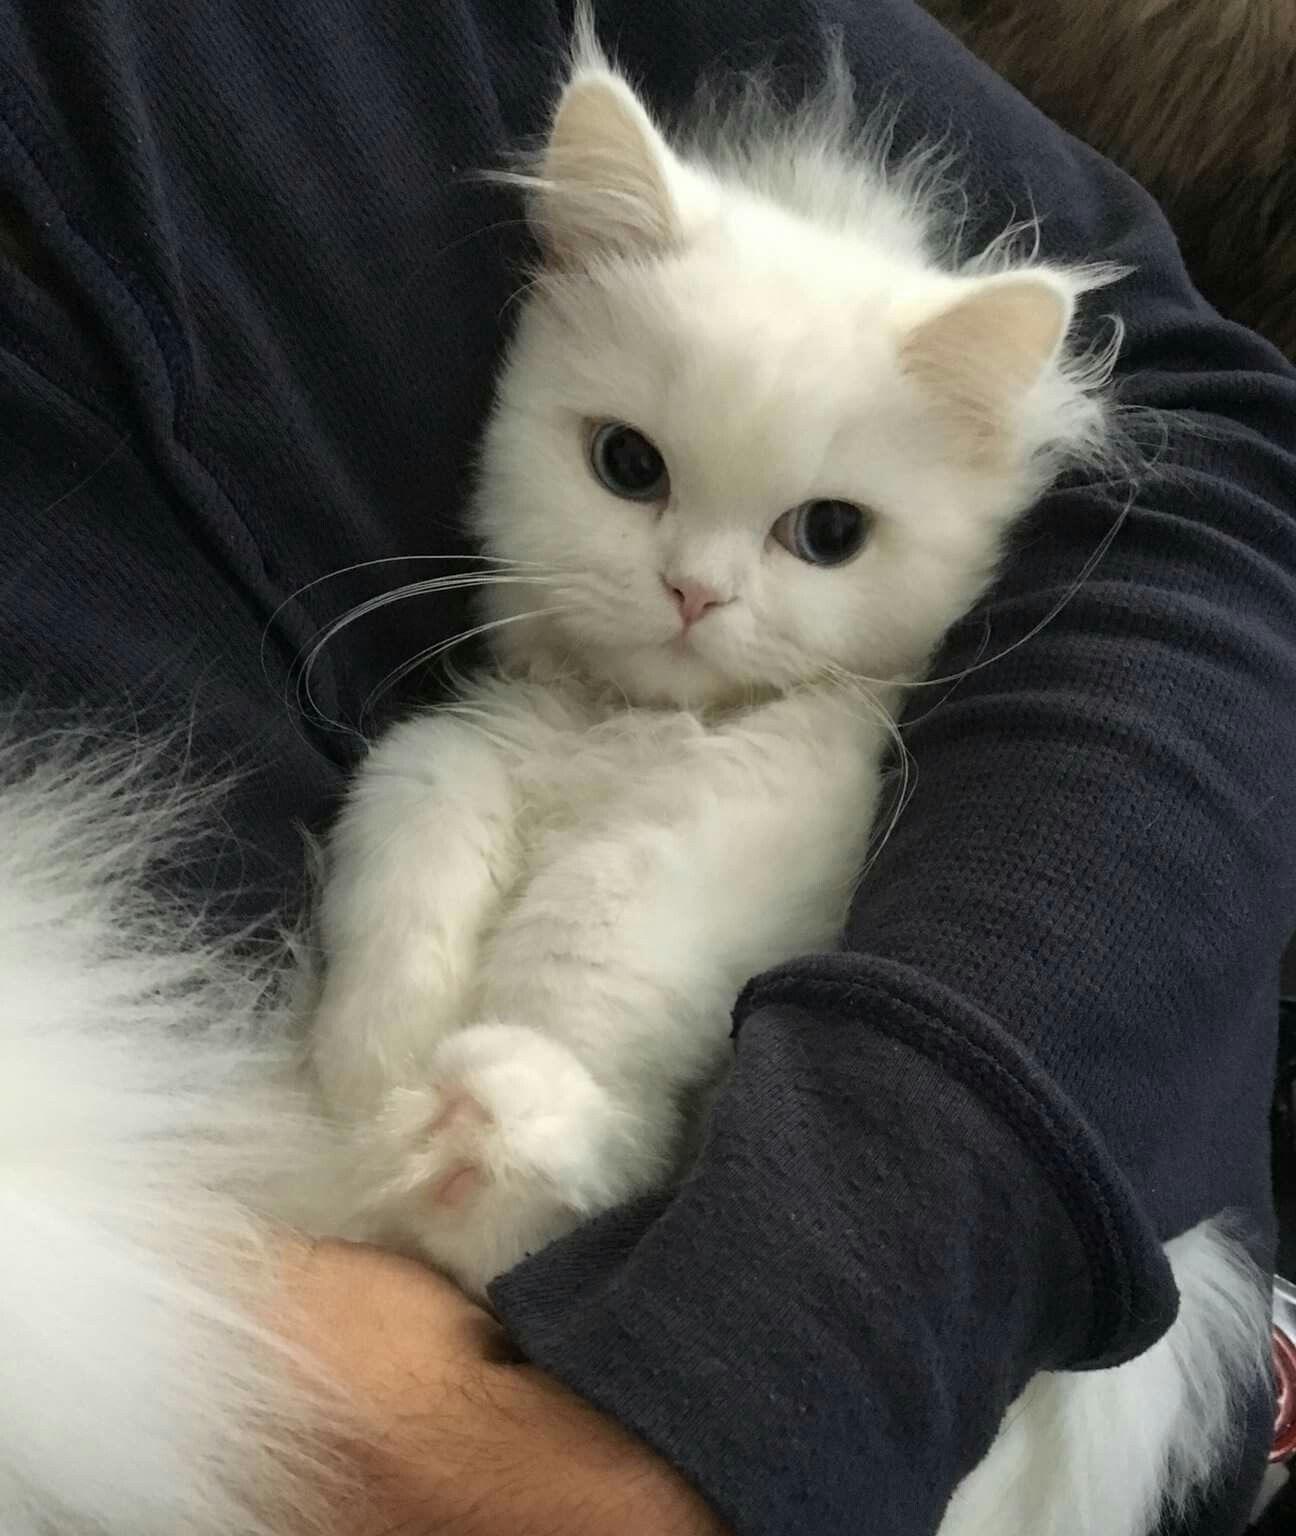 Couple Bilder Bett Snapchat Coupleswholift Coupleselfie Coupleswhotravel In 2020 Baby Animals Cats Cute Animals